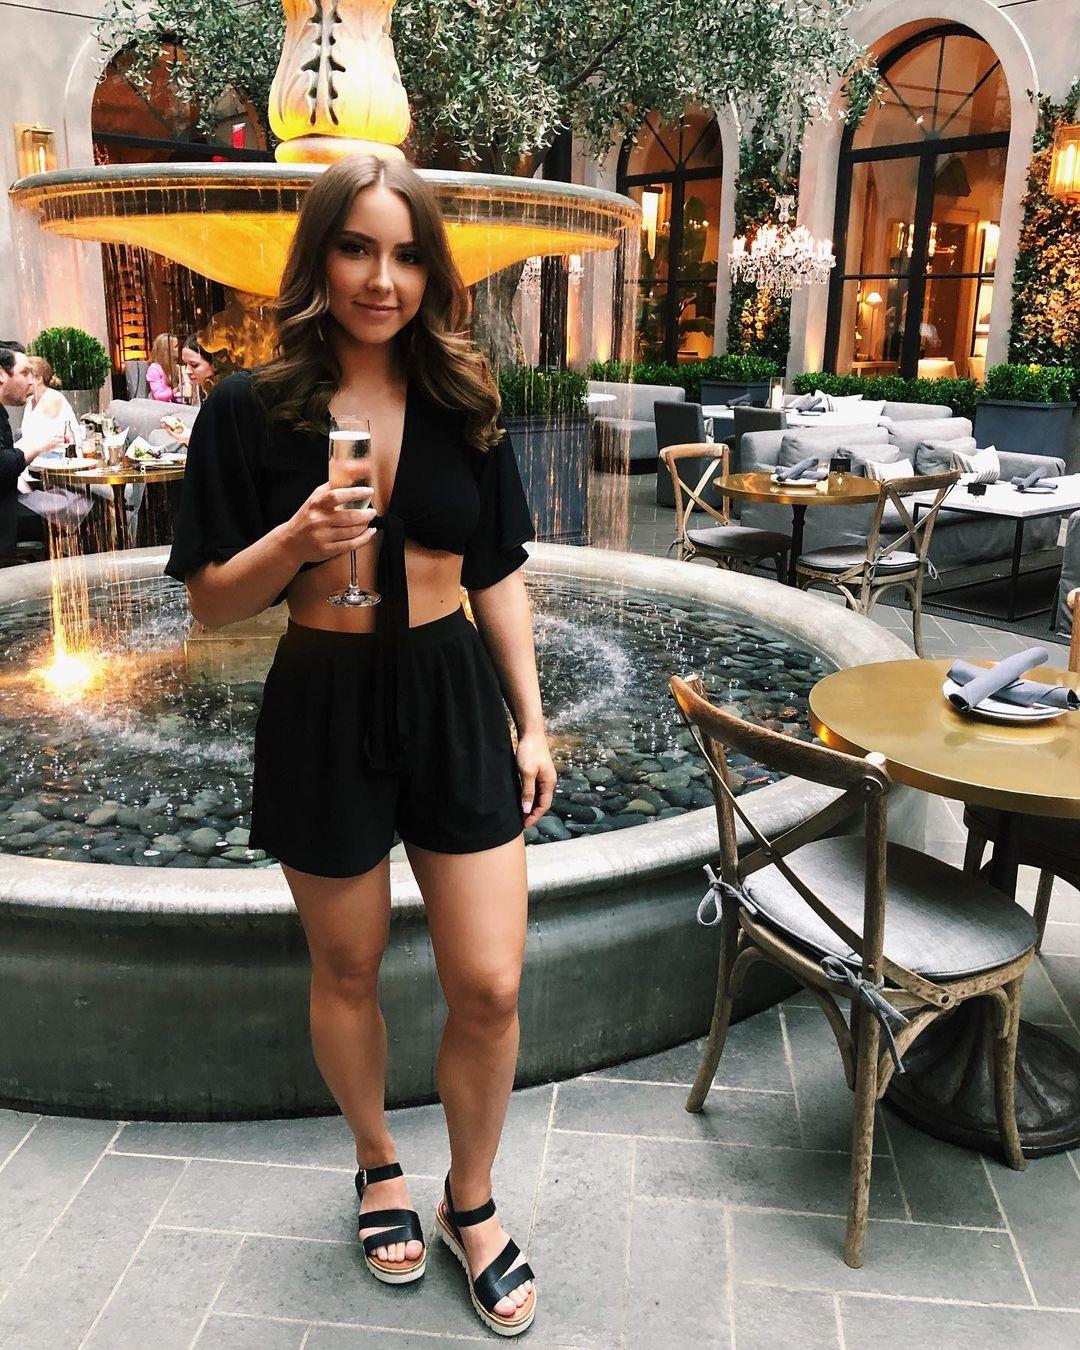 Hailie Jade/Instagram